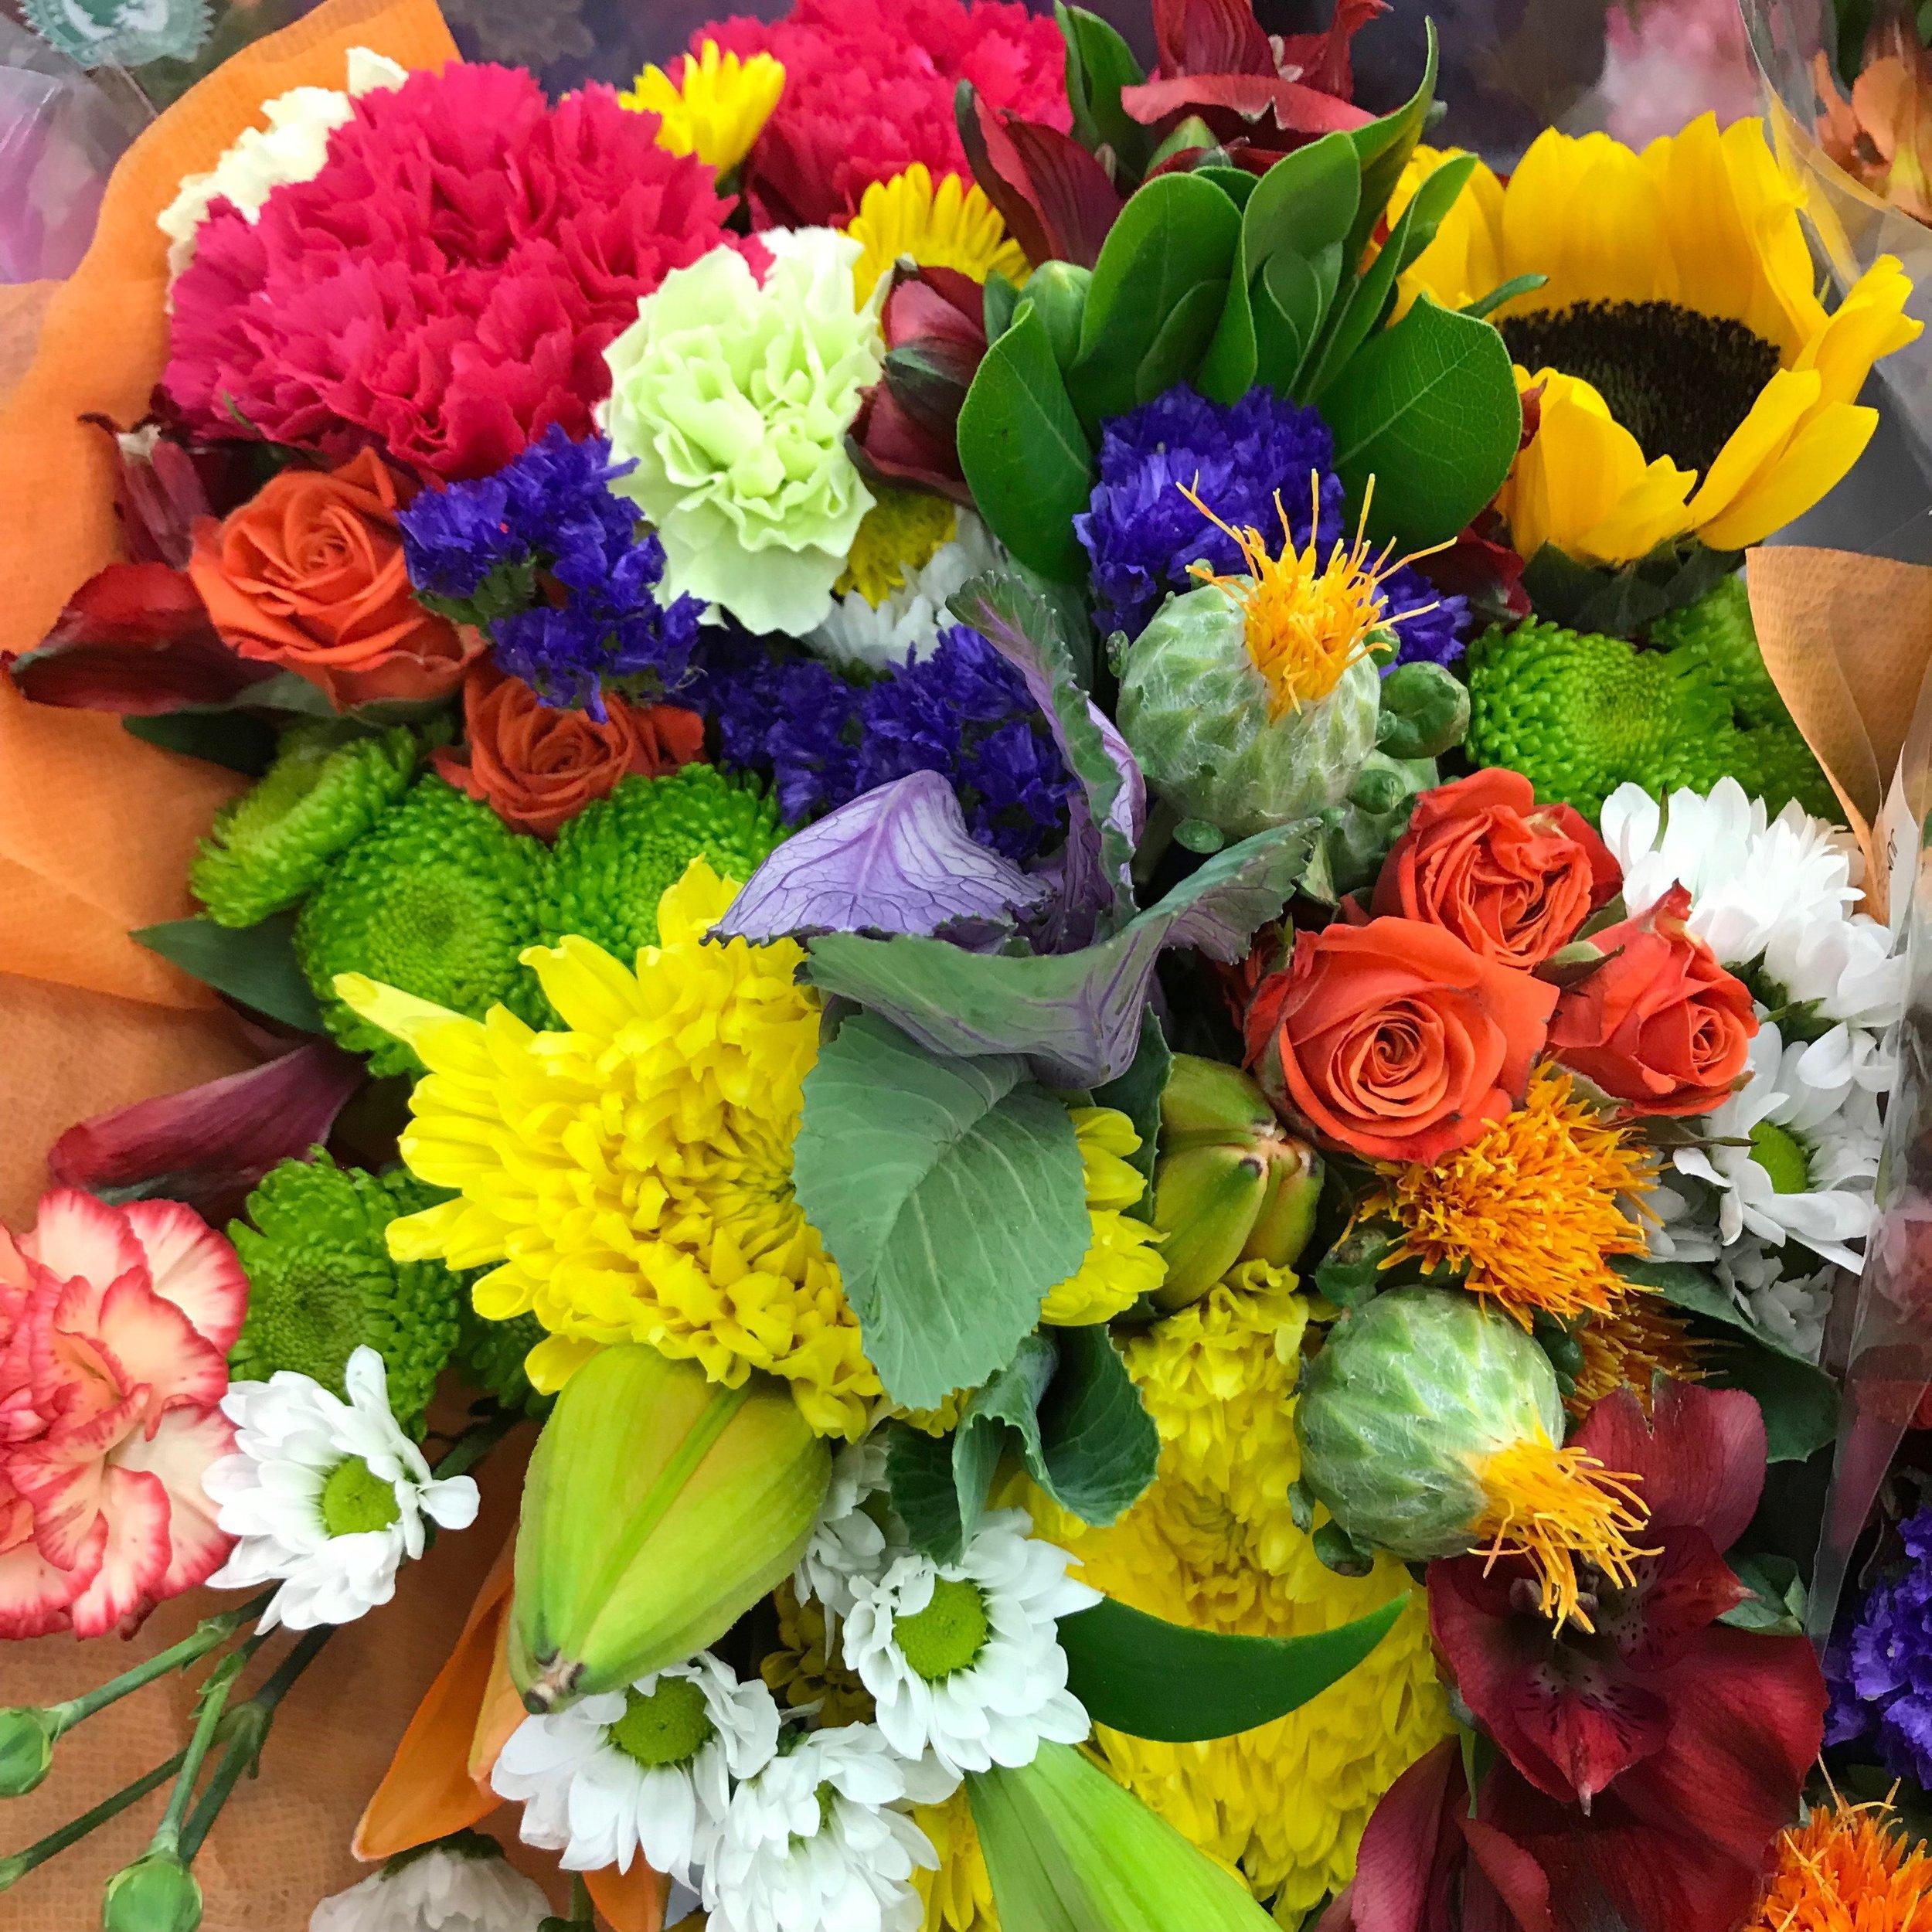 Spring Jumbo Bouquets 16 98 Sam S Simple Savings